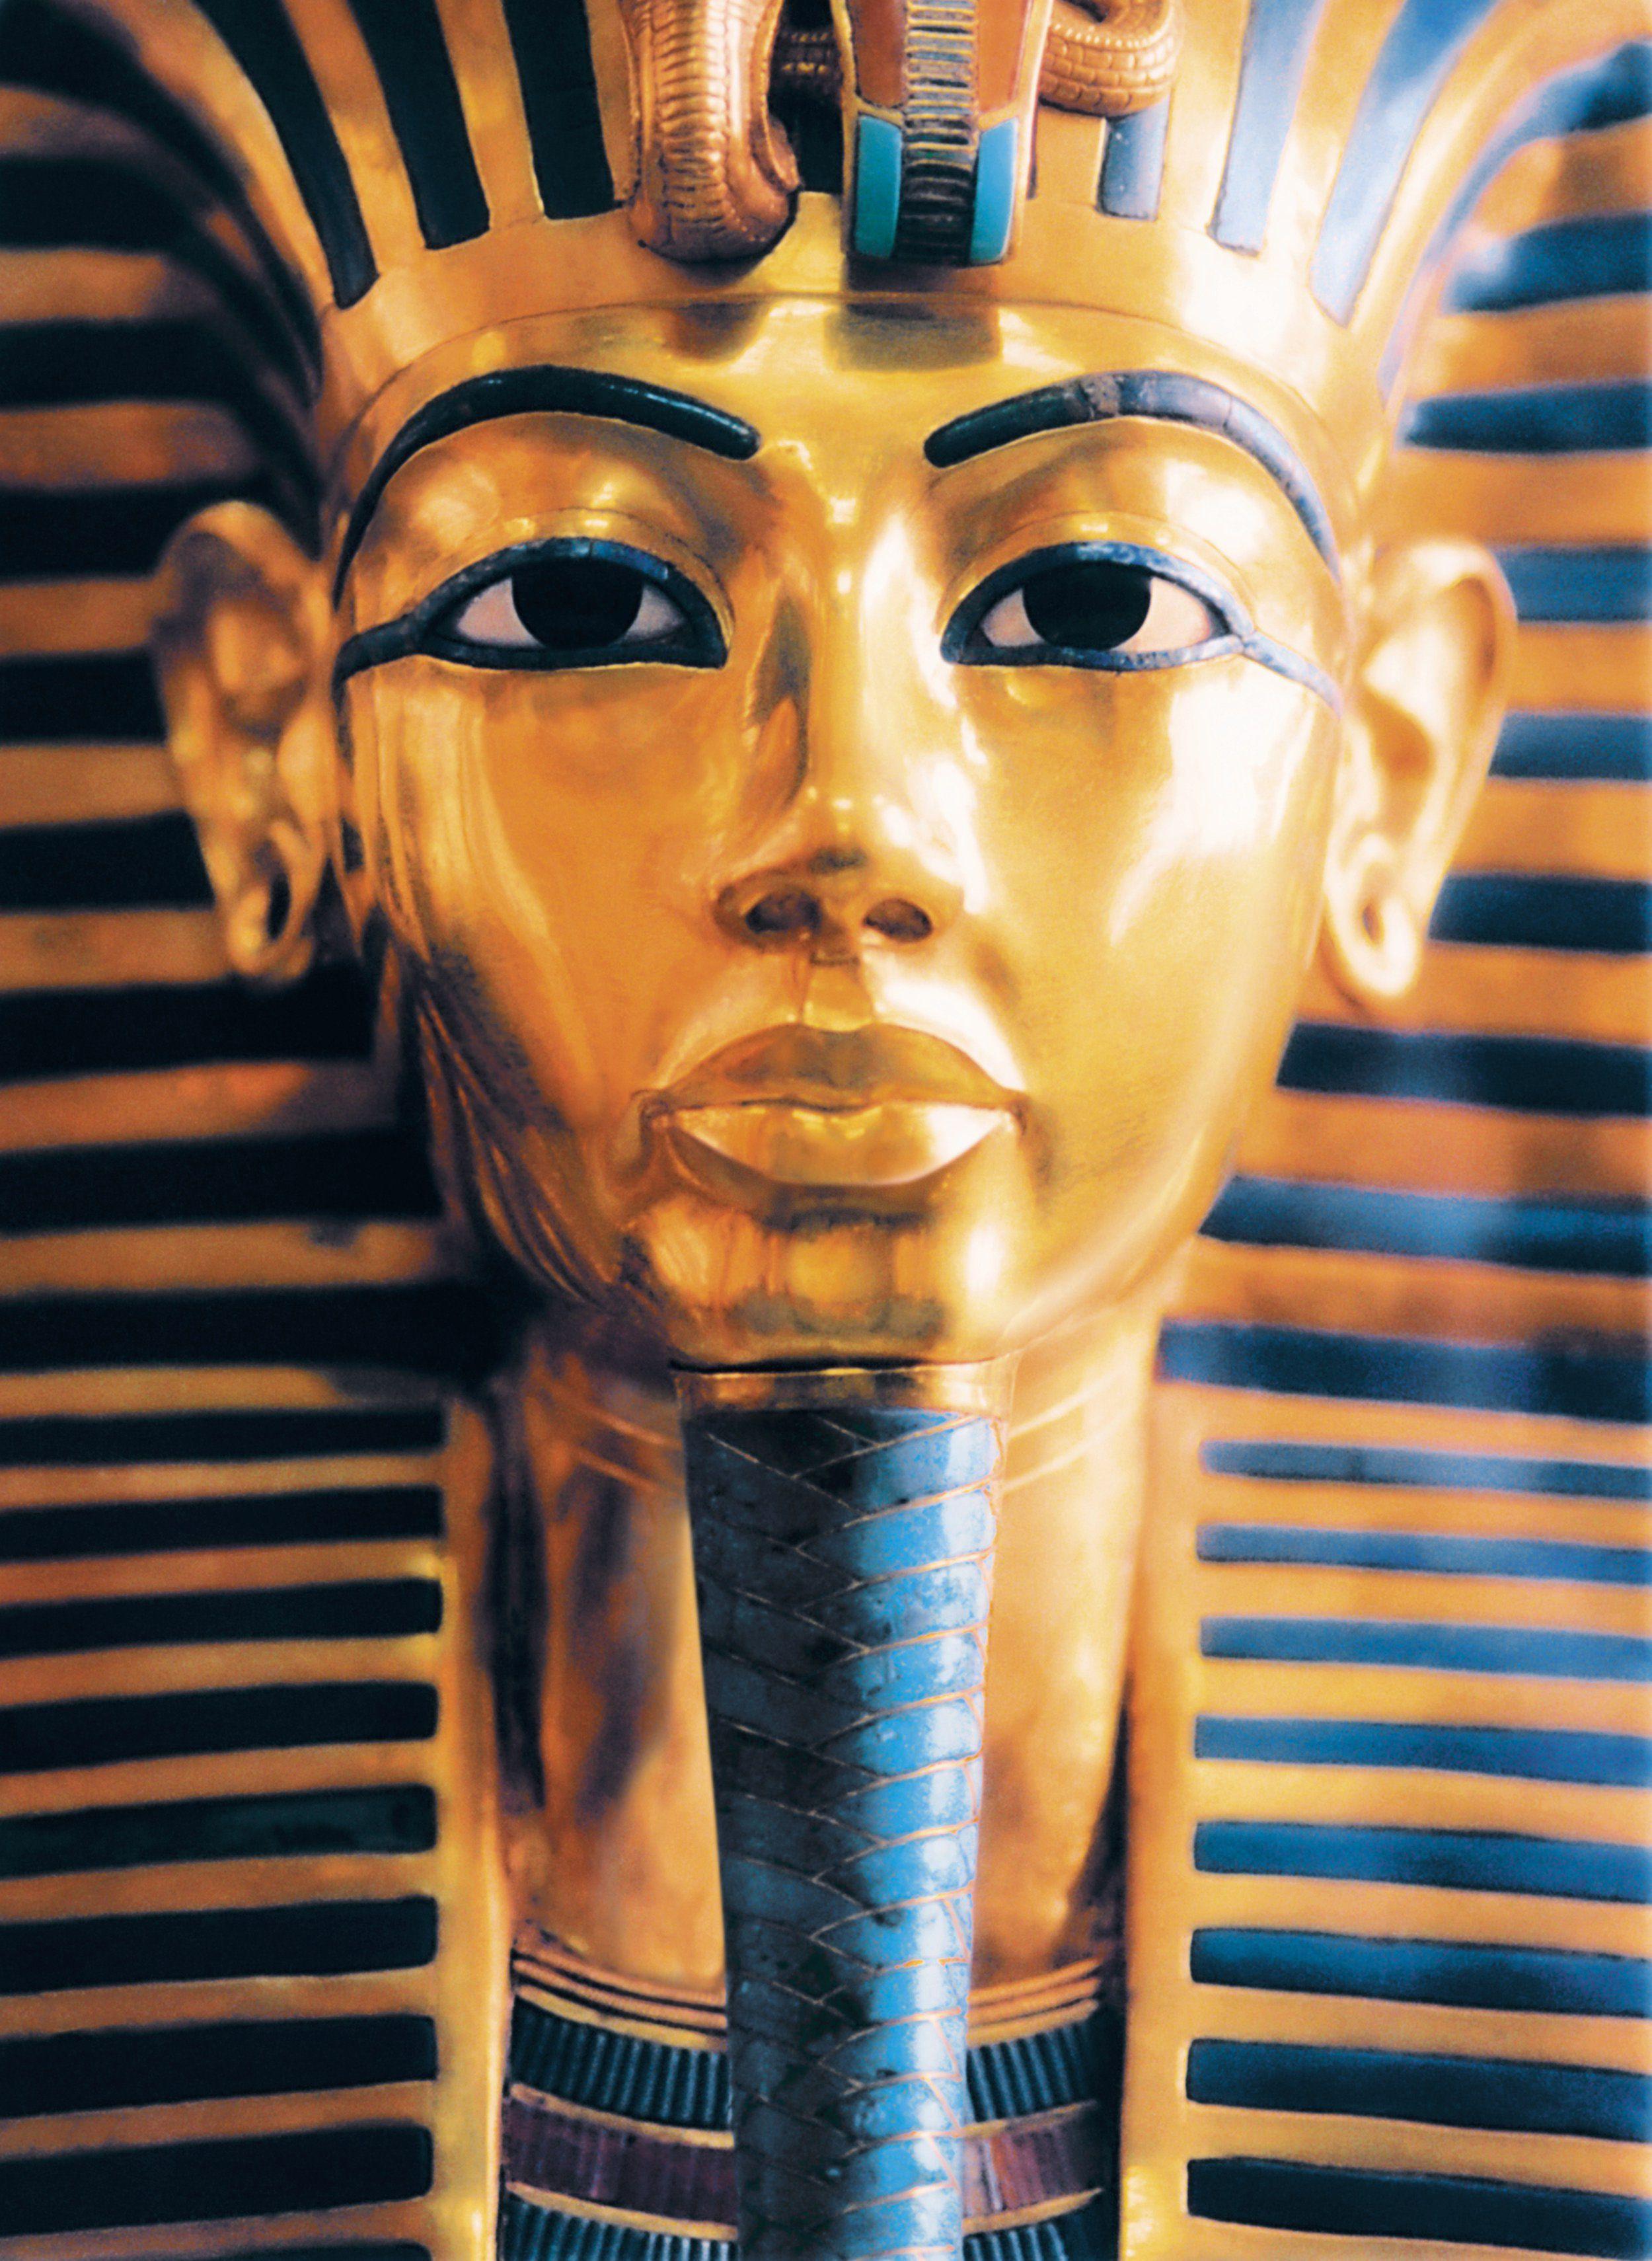 How Did King Tutankhamun Die?